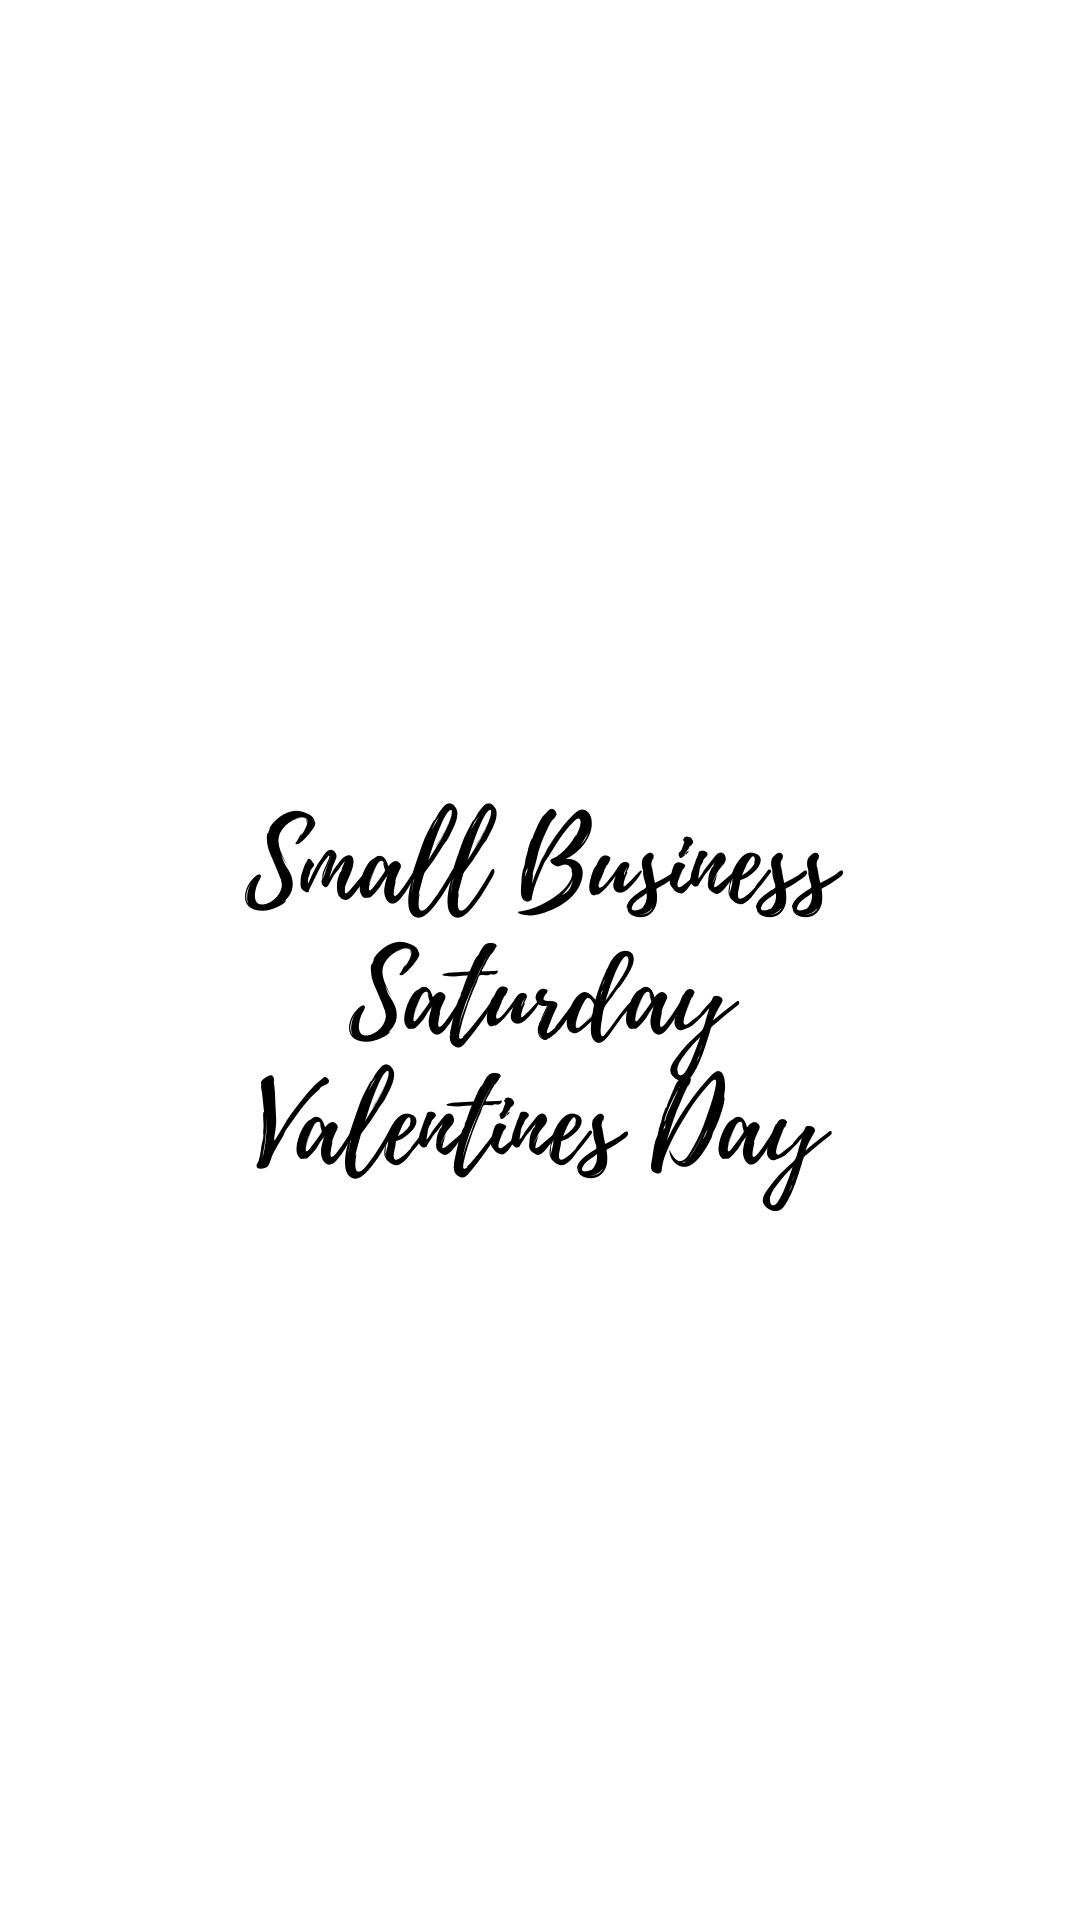 Small Business Saturday-Valentine's Day